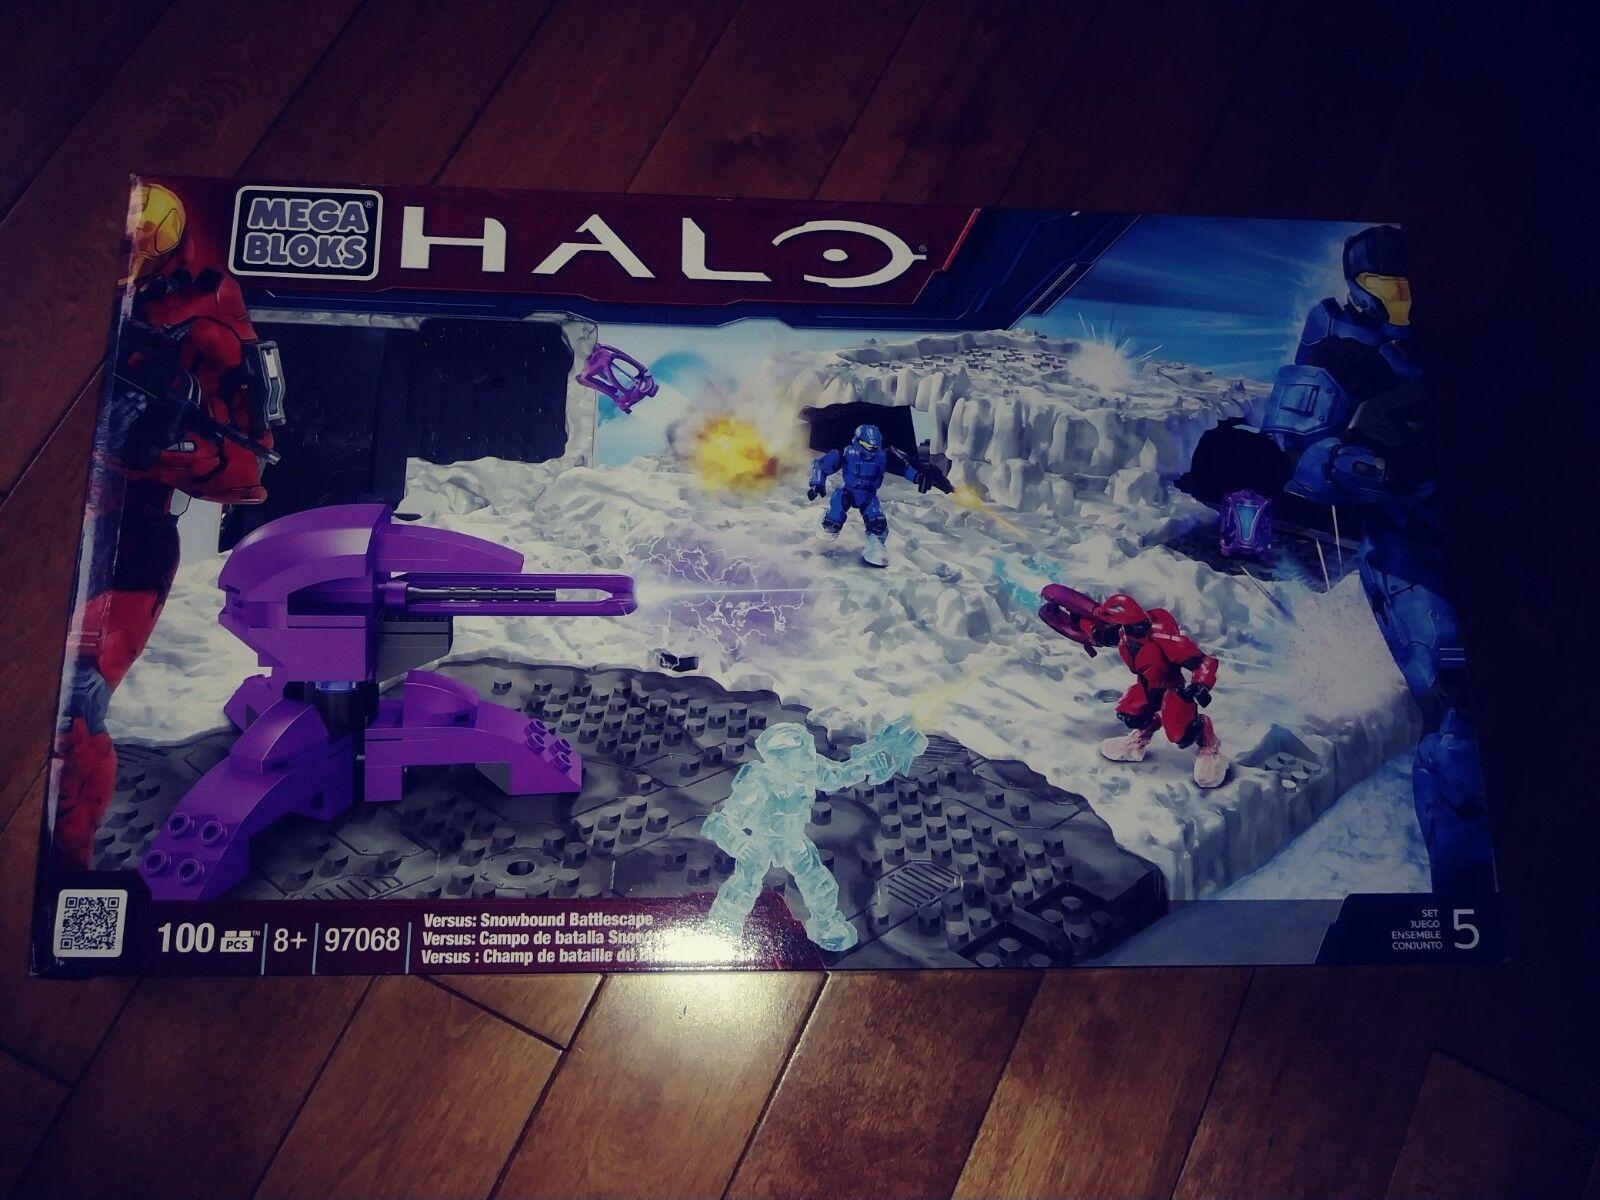 Mega Bloks Halo Halo Halo Versus   Snowbound Battlescape 100 pcs w  3 Figures NEW f83430